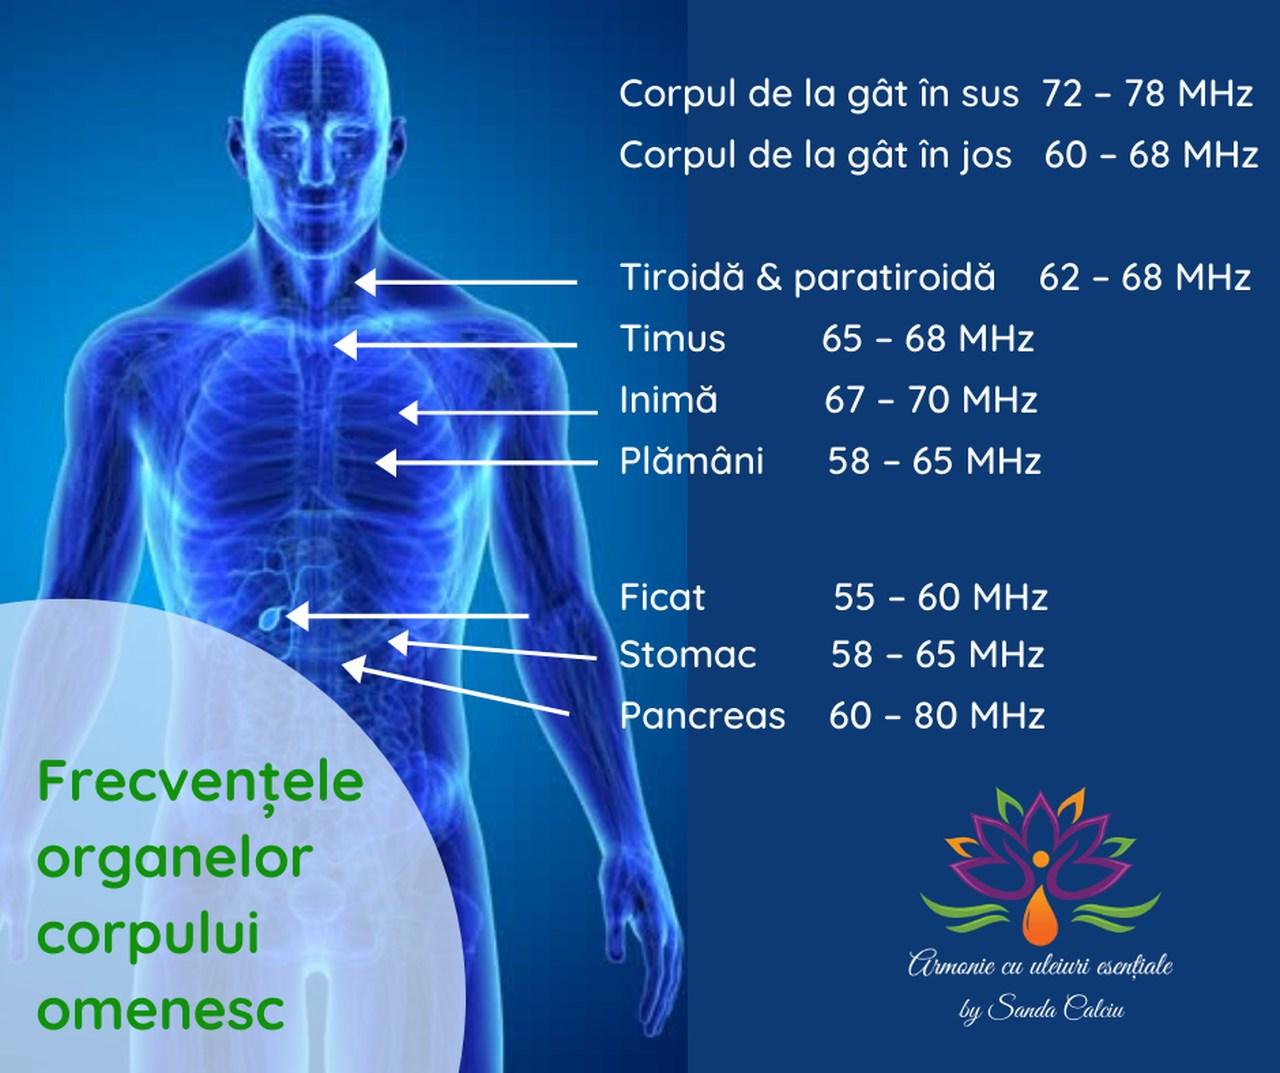 Frecventa organelor corpului omenesc_resized